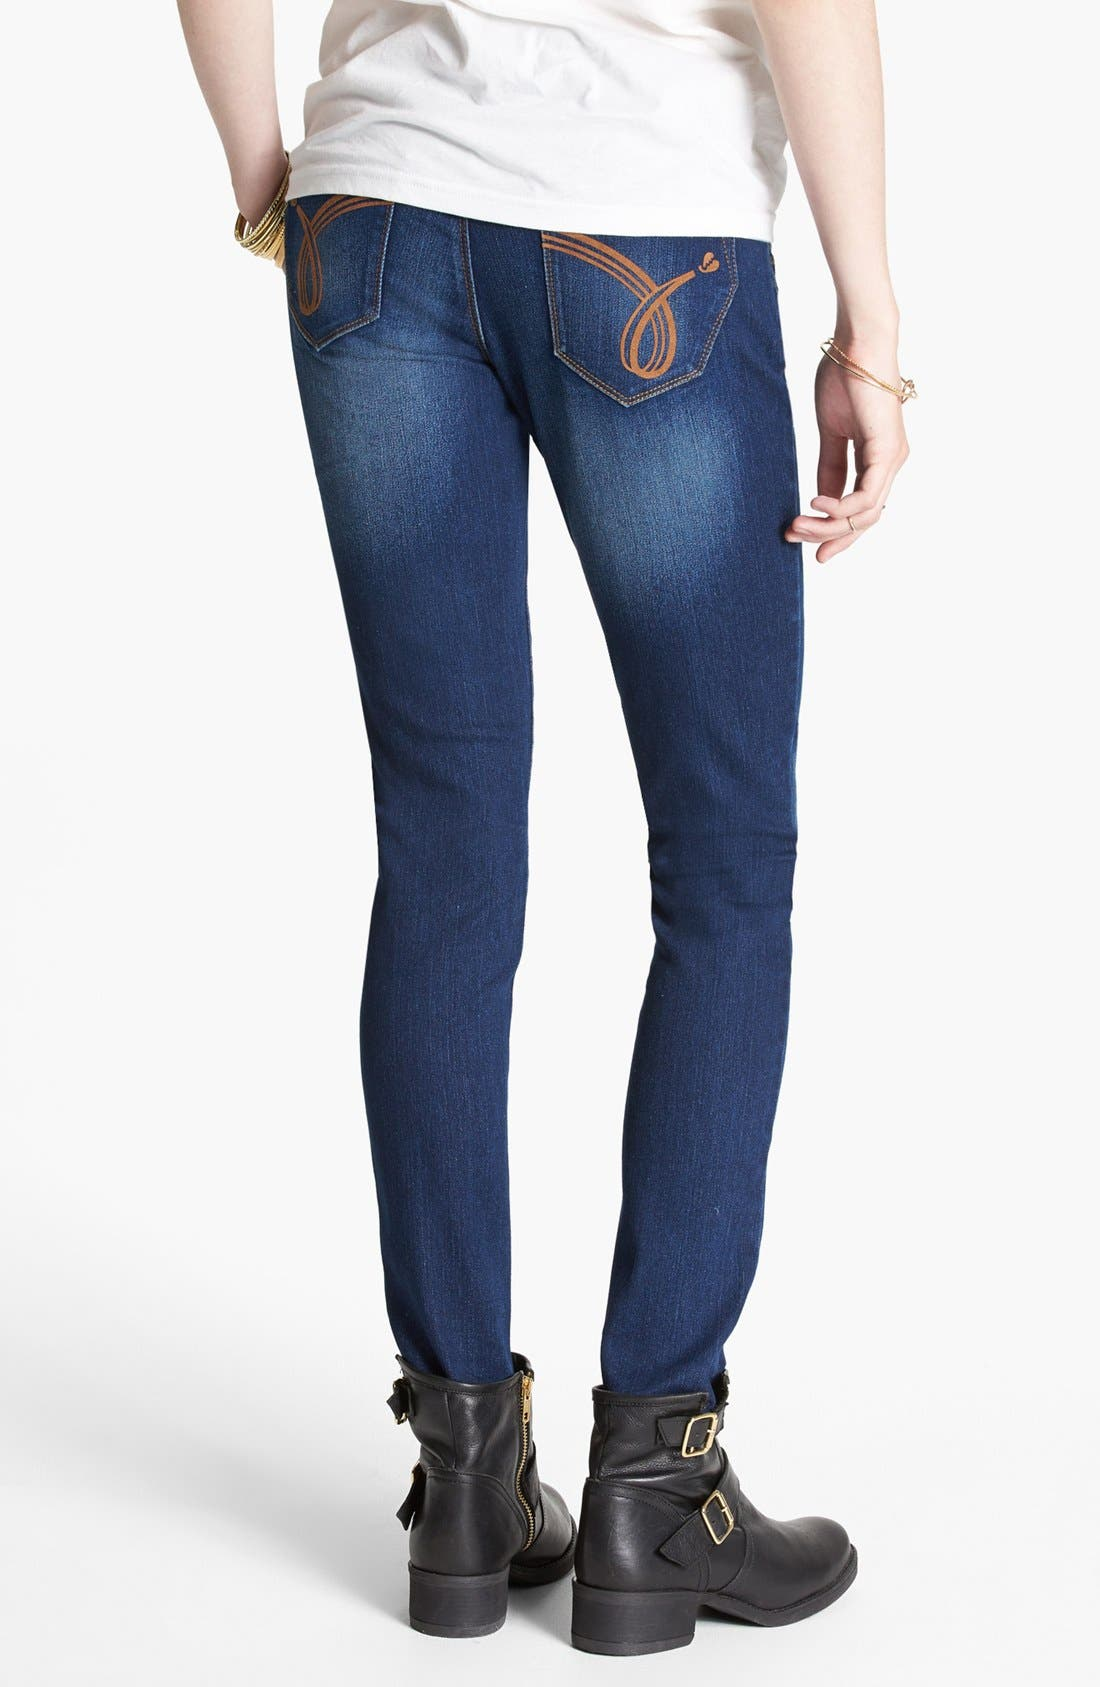 Alternate Image 2  - Jolt Faded Skinny Jeans (Dark) (Juniors) (Online Only)